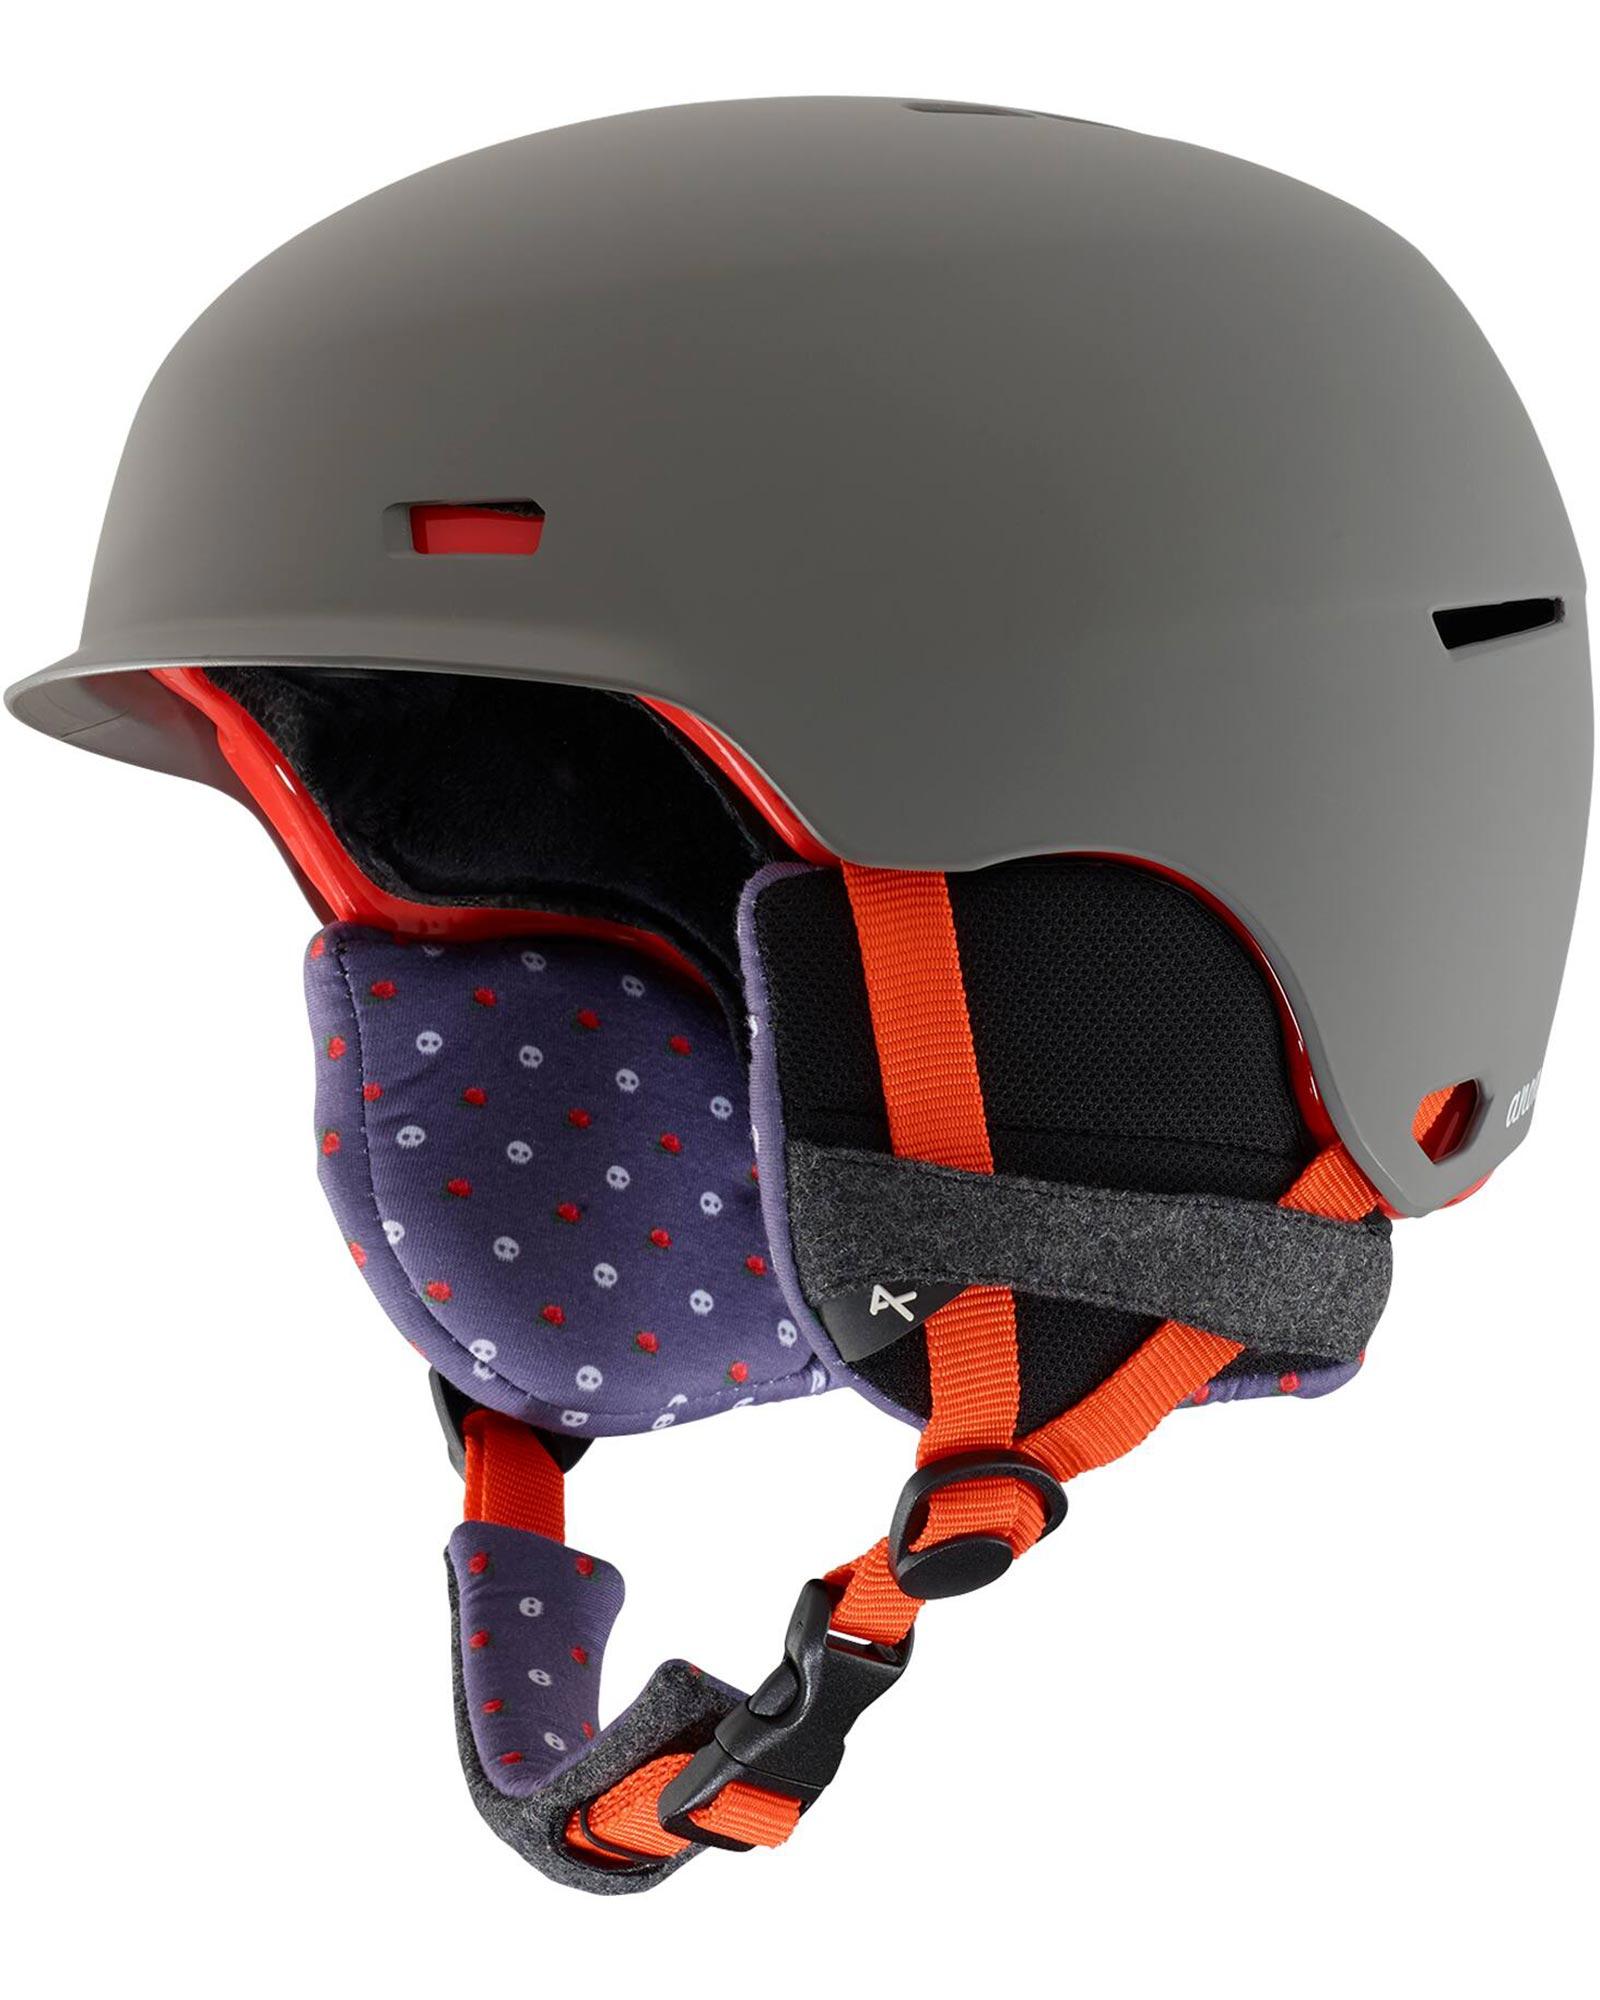 Anon Snowboarding-Helmets Raven MIPS Helmet